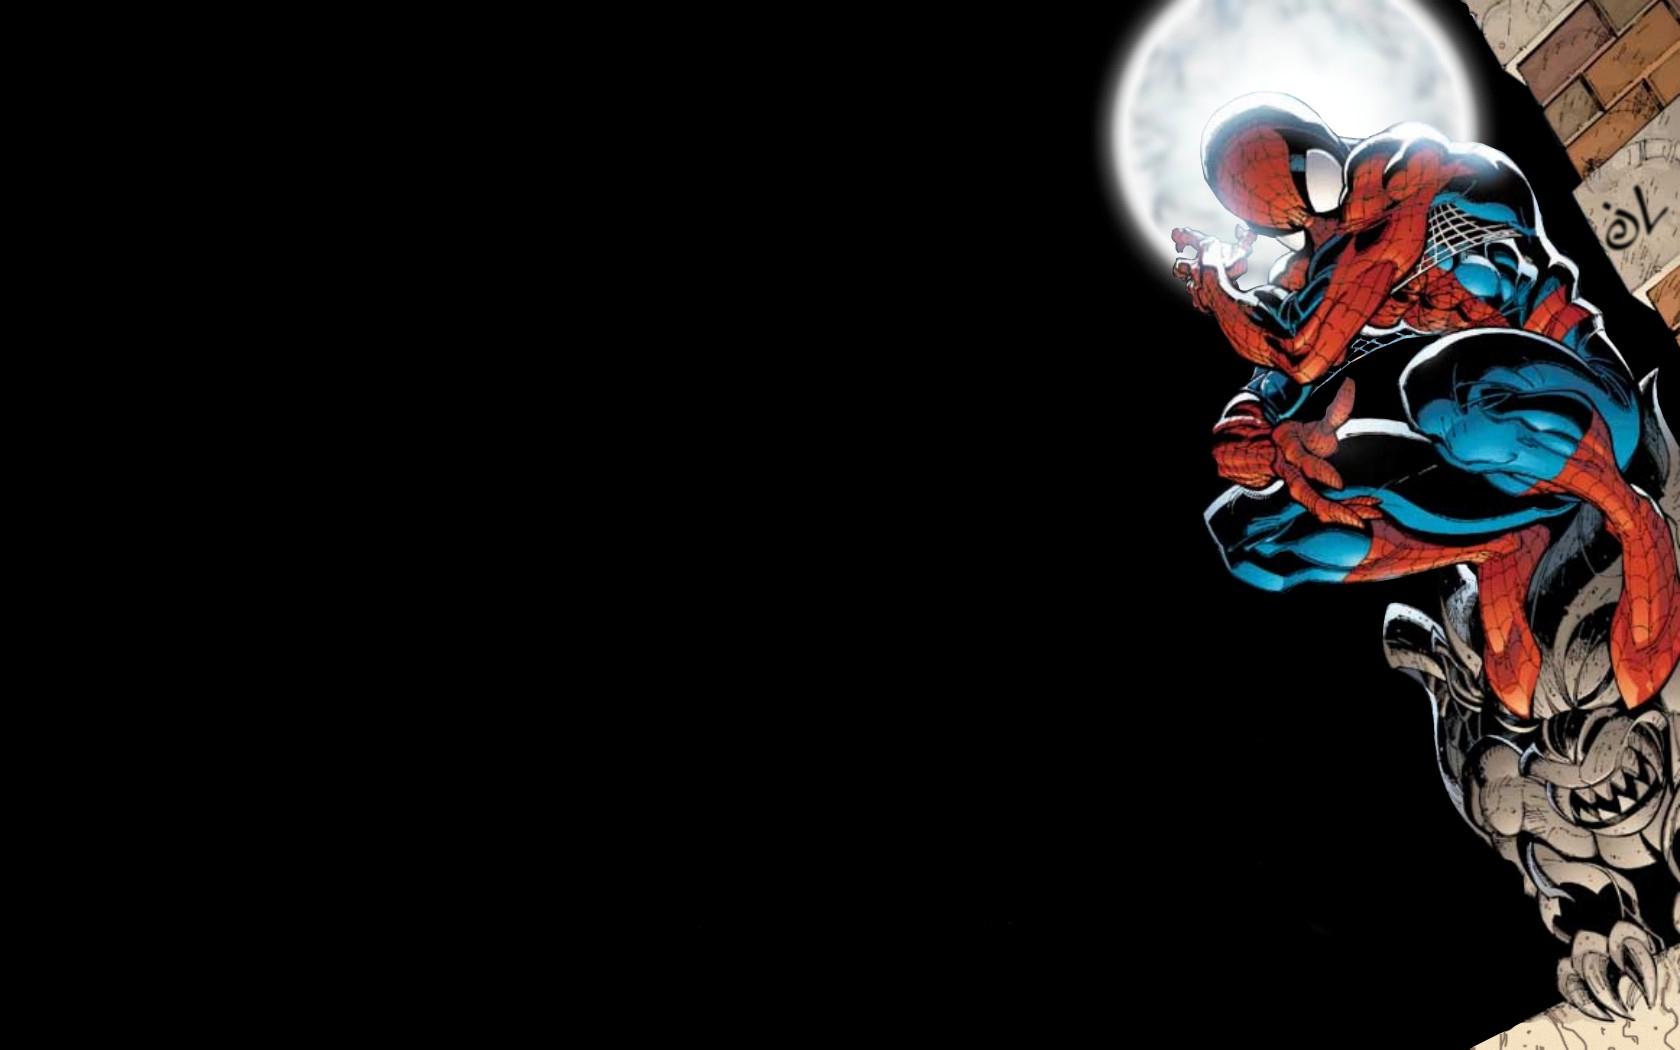 Spider man comic wallpaper - photo#24